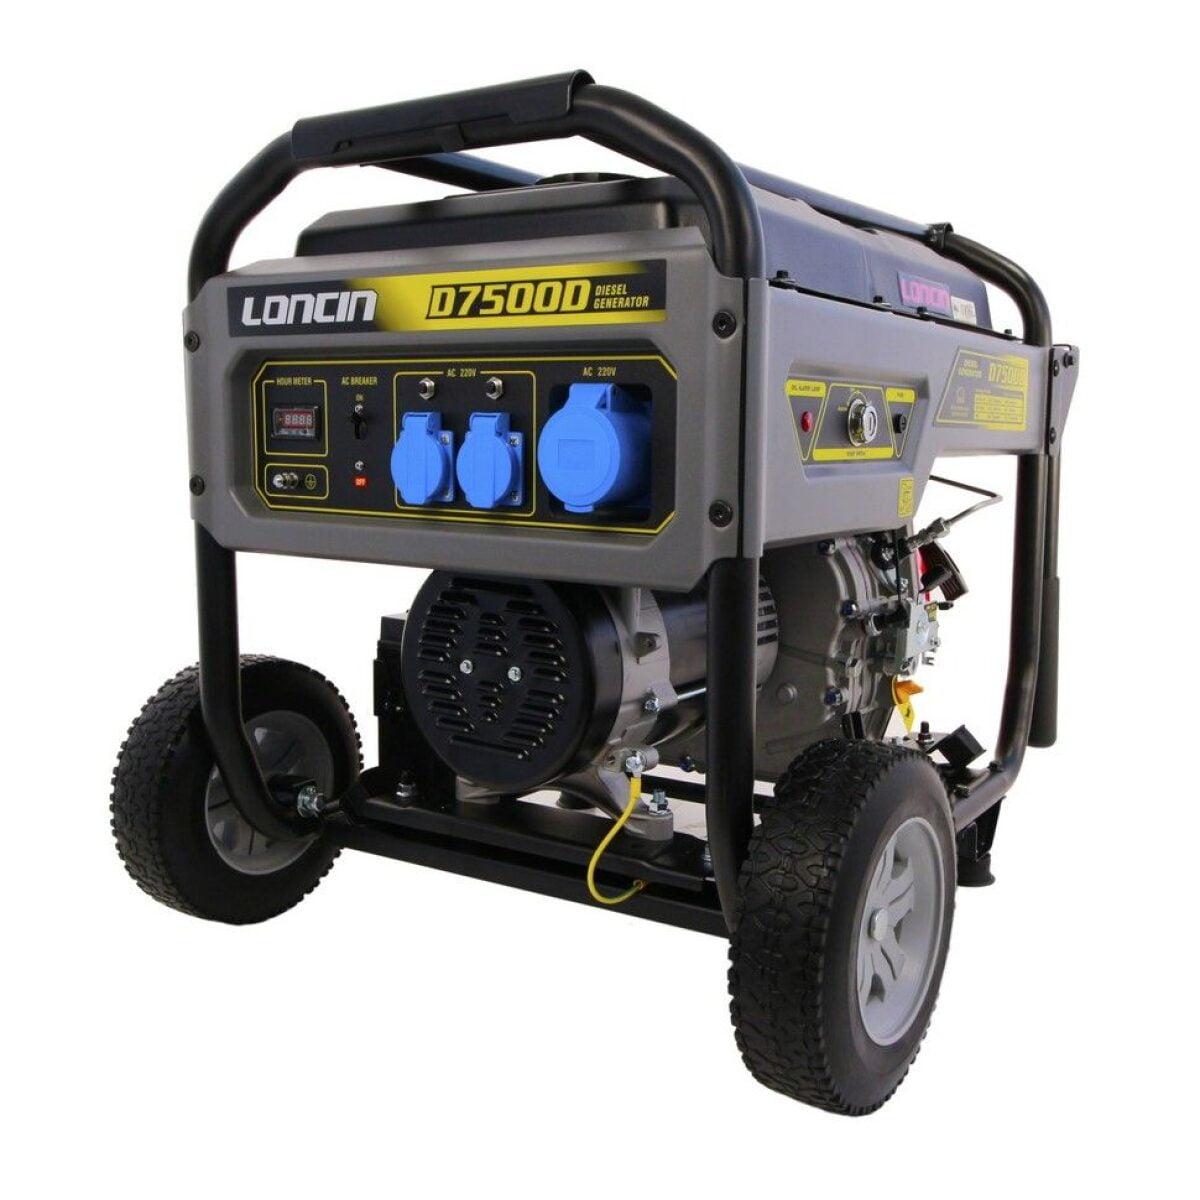 lcd7500d generator loncin 6 0kw 220v diesel o mac.ro 2